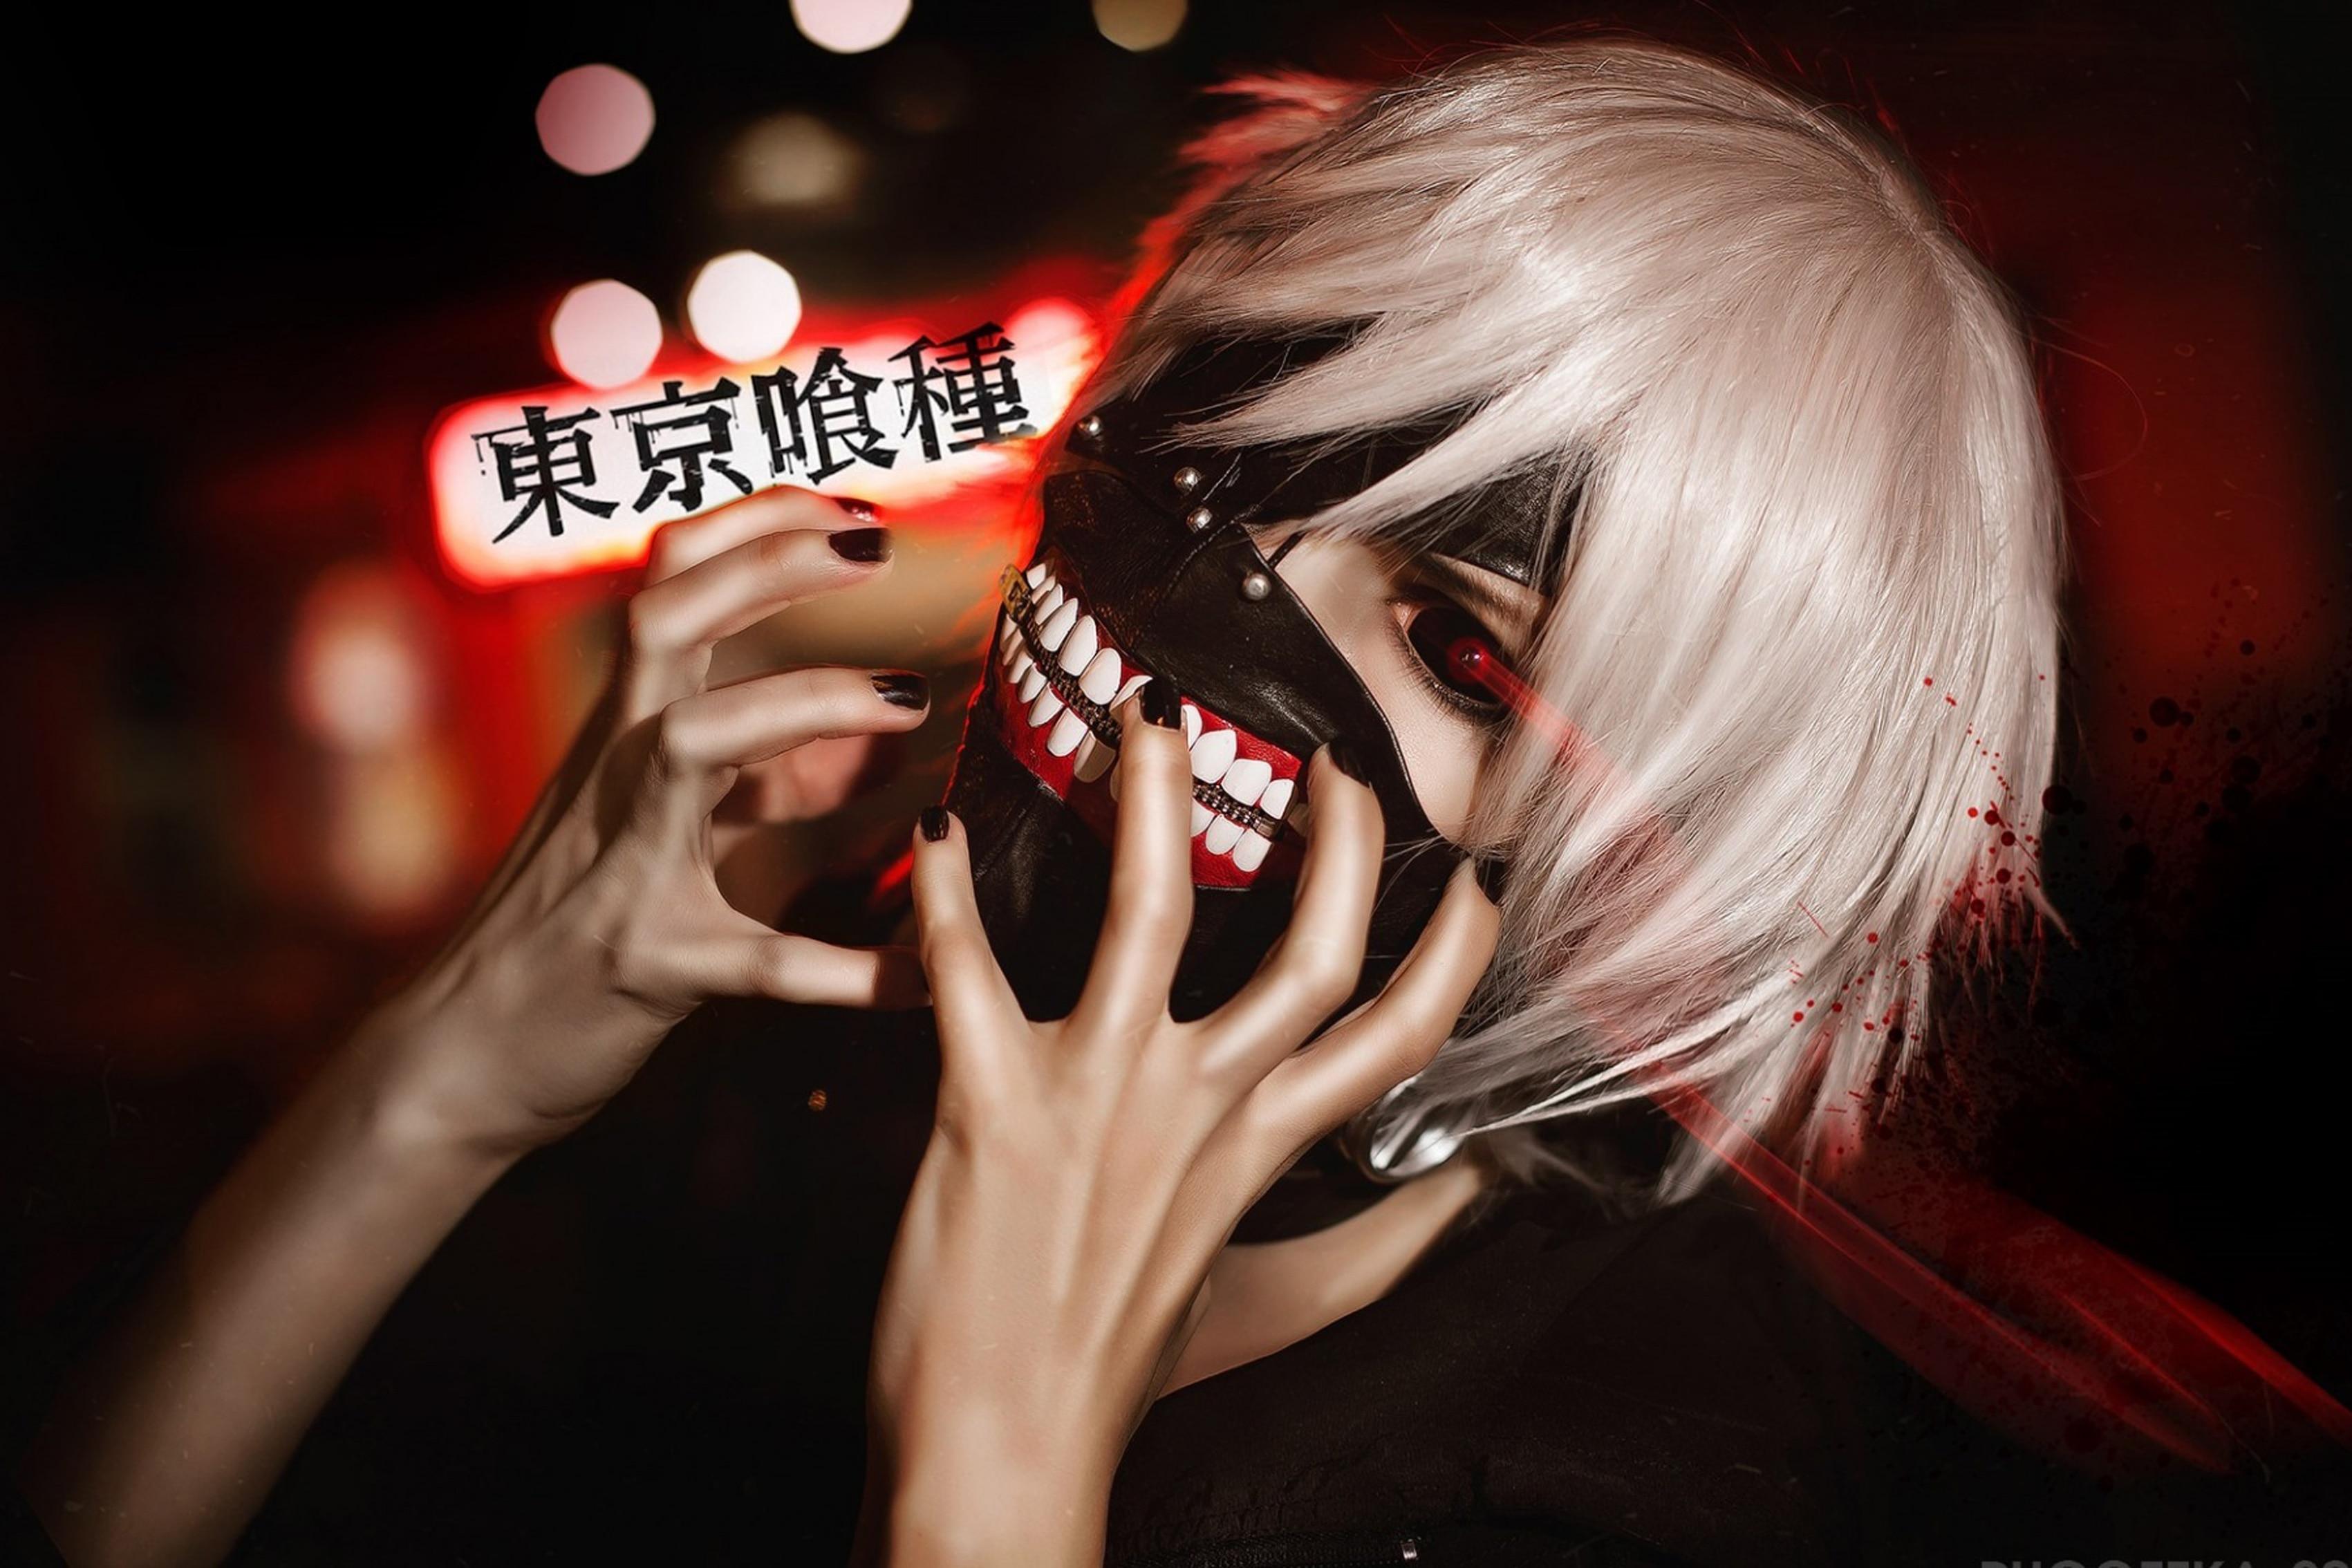 Home decoration Tokyo ghoul The Kaneko Ken mask cosplay guy Silk Fabric Poster Print CB32